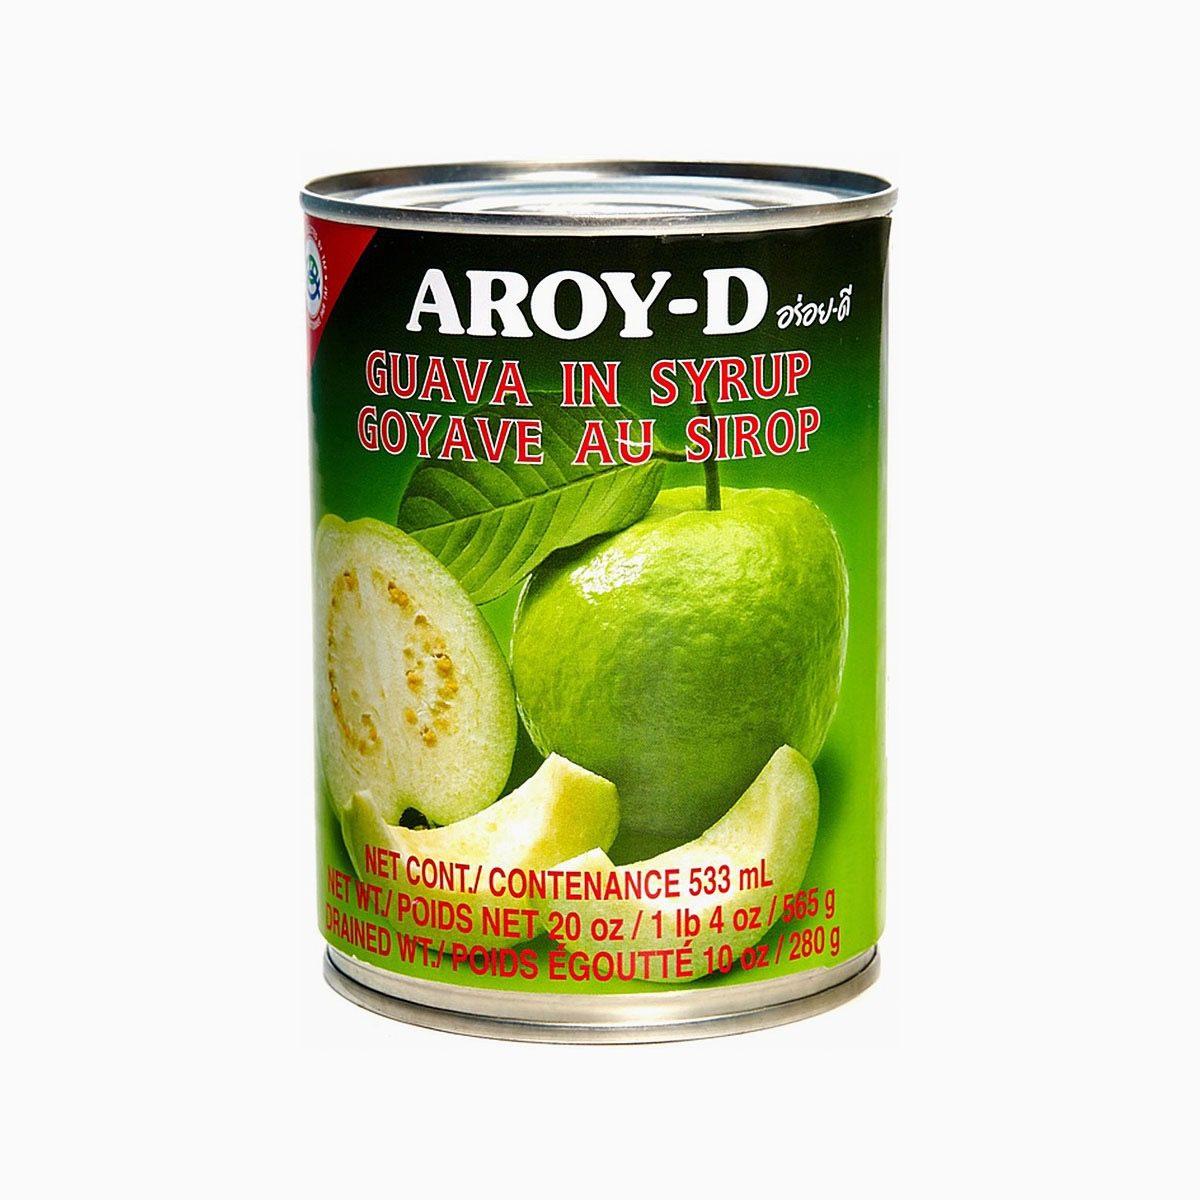 Гуава в сиропе, Aroy-d, 565 гр